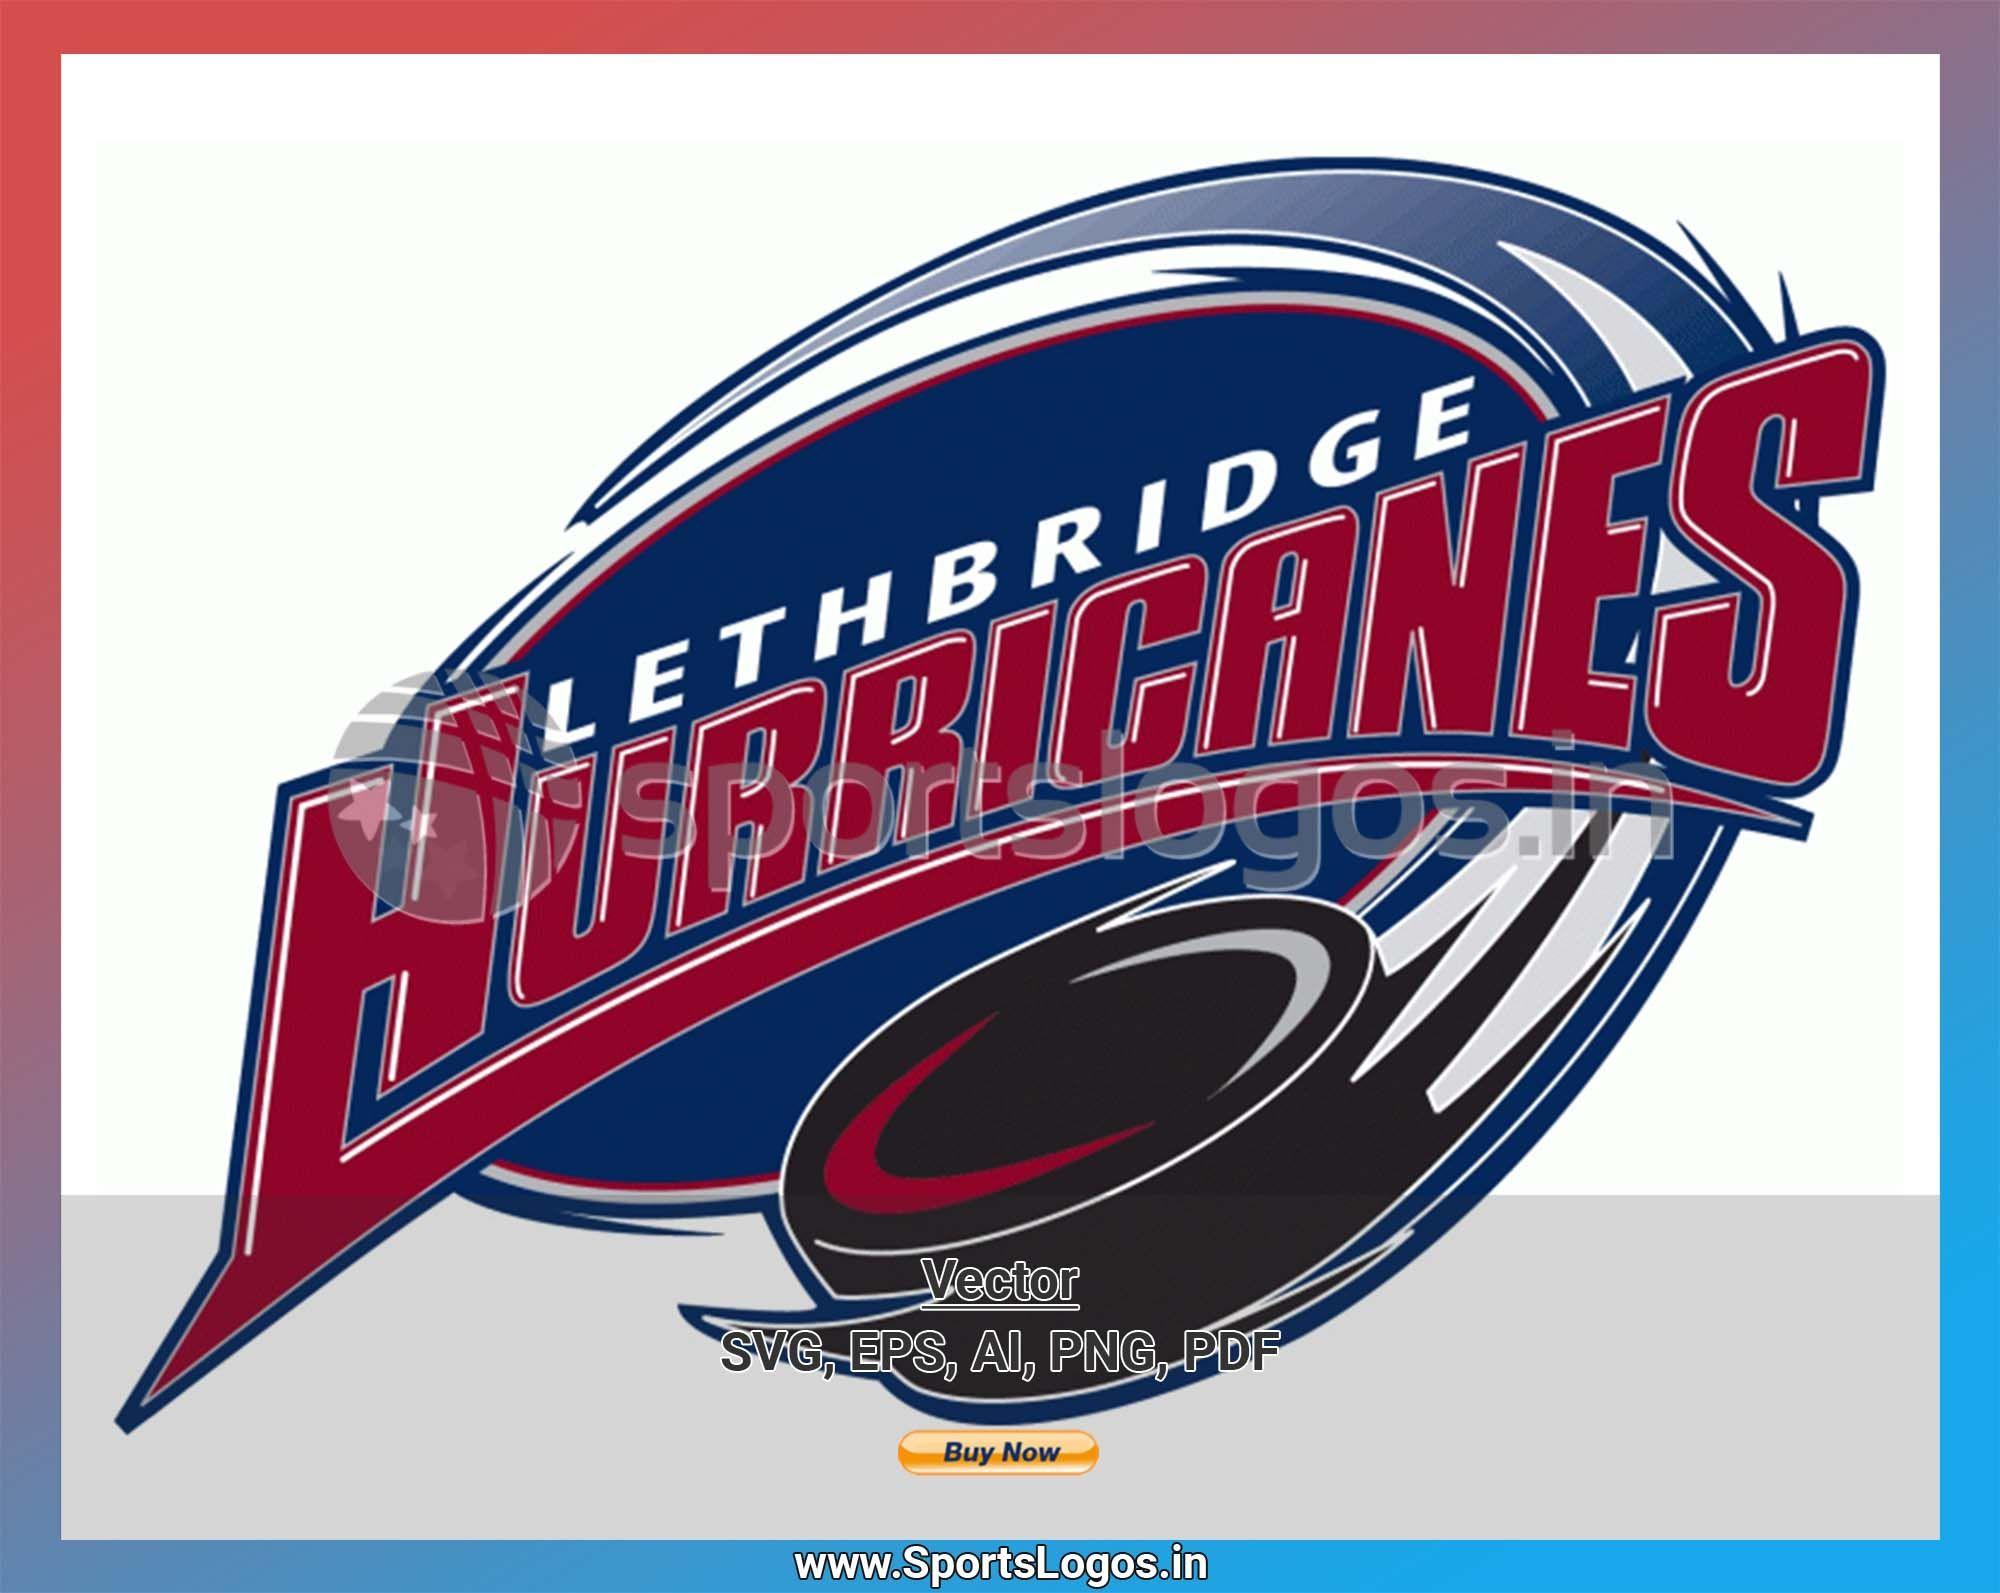 Lethbridge Hurricanes 2004/052008/09, Western Hockey